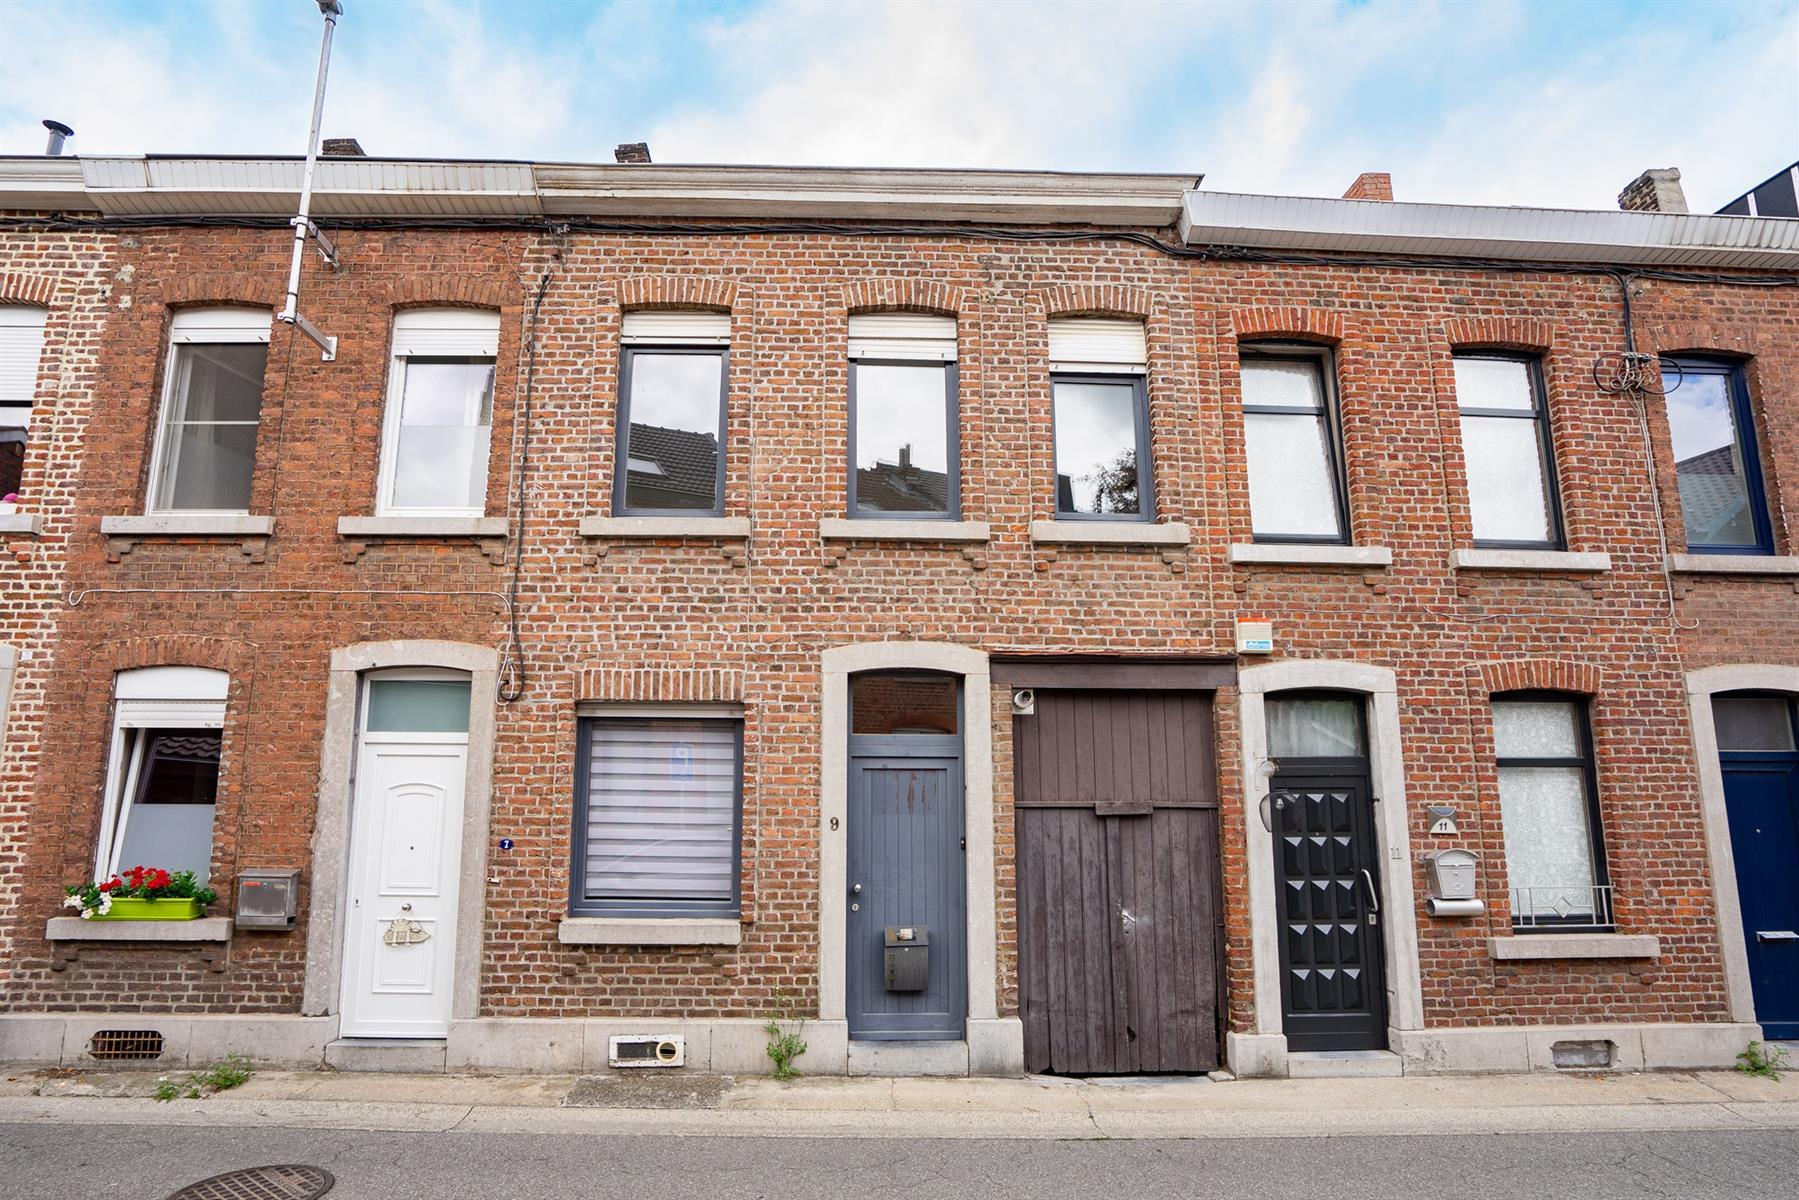 Maison - Beyne-Heusay Bellaire - #4422118-1